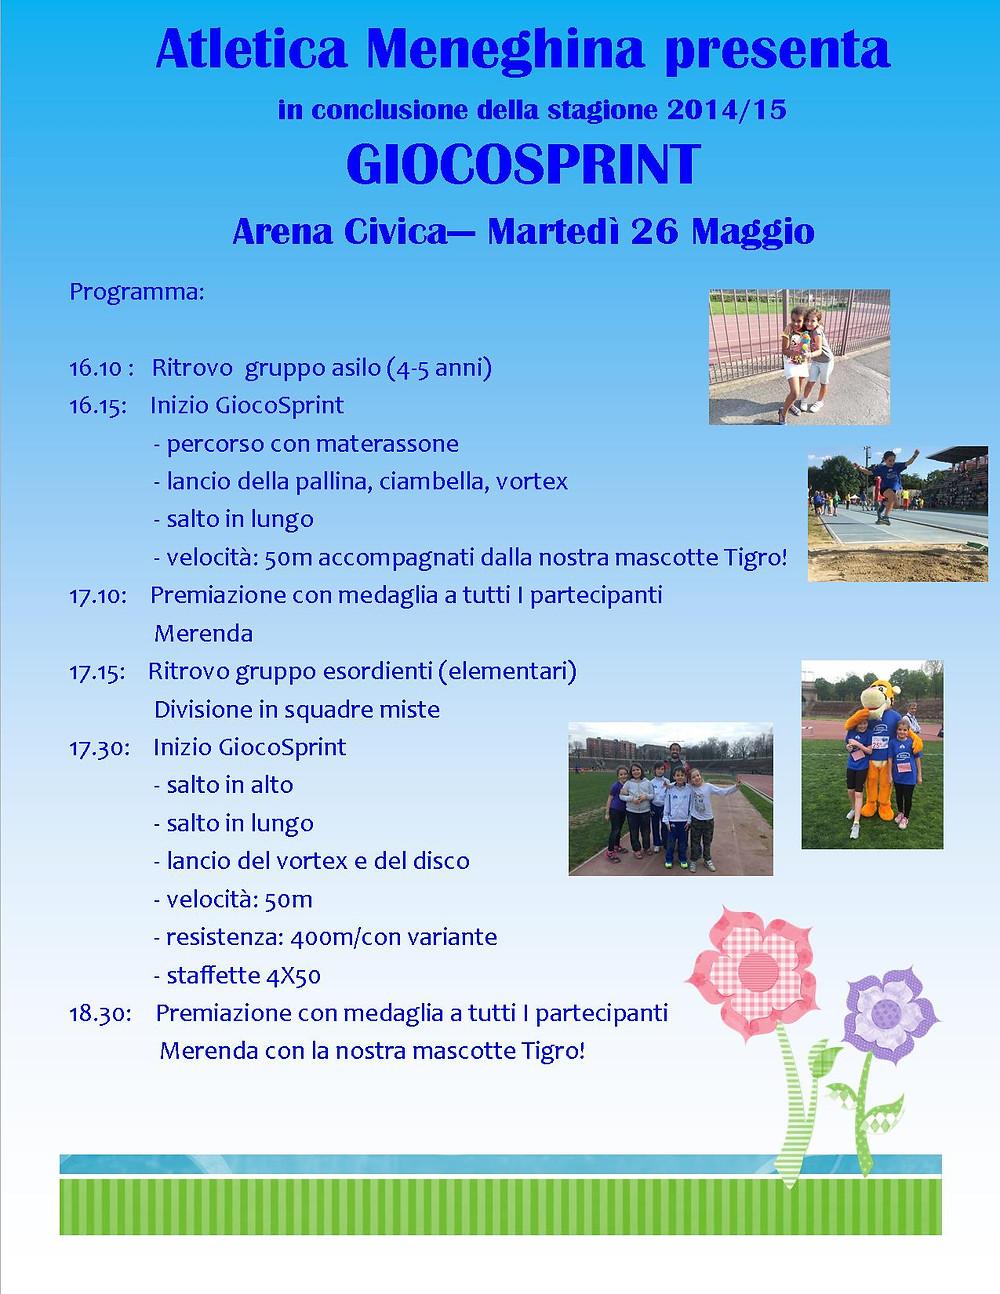 Programma GiocoSprint.jpg